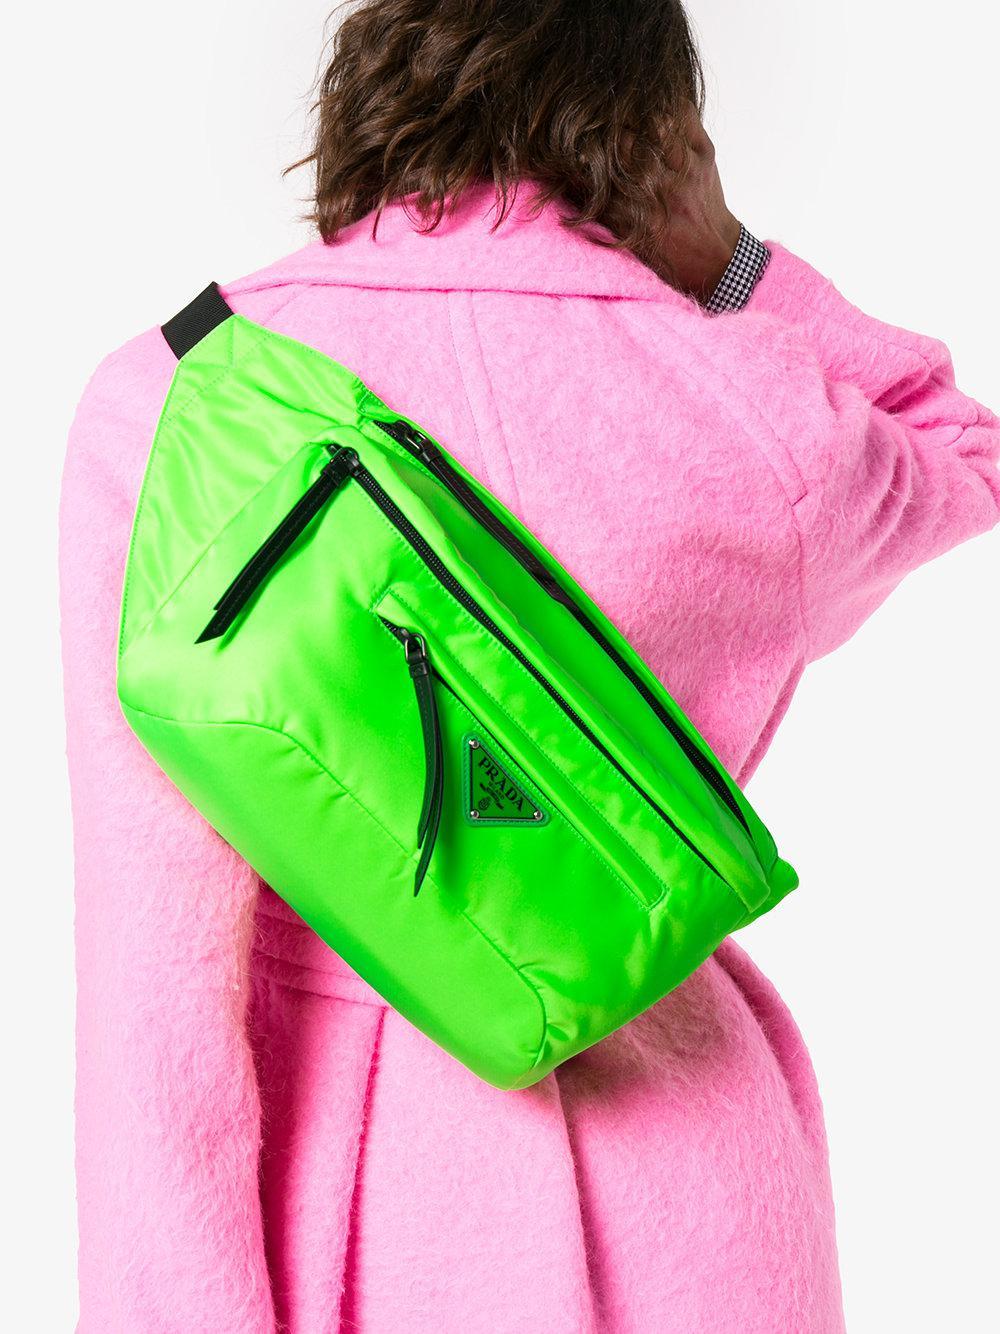 492ed6b596 ... backpack tulips dc6ec 99a6c ireland prada green fluorescent nylon belt  bag lyst. view fullscreen 6fb9b ebd62 ...